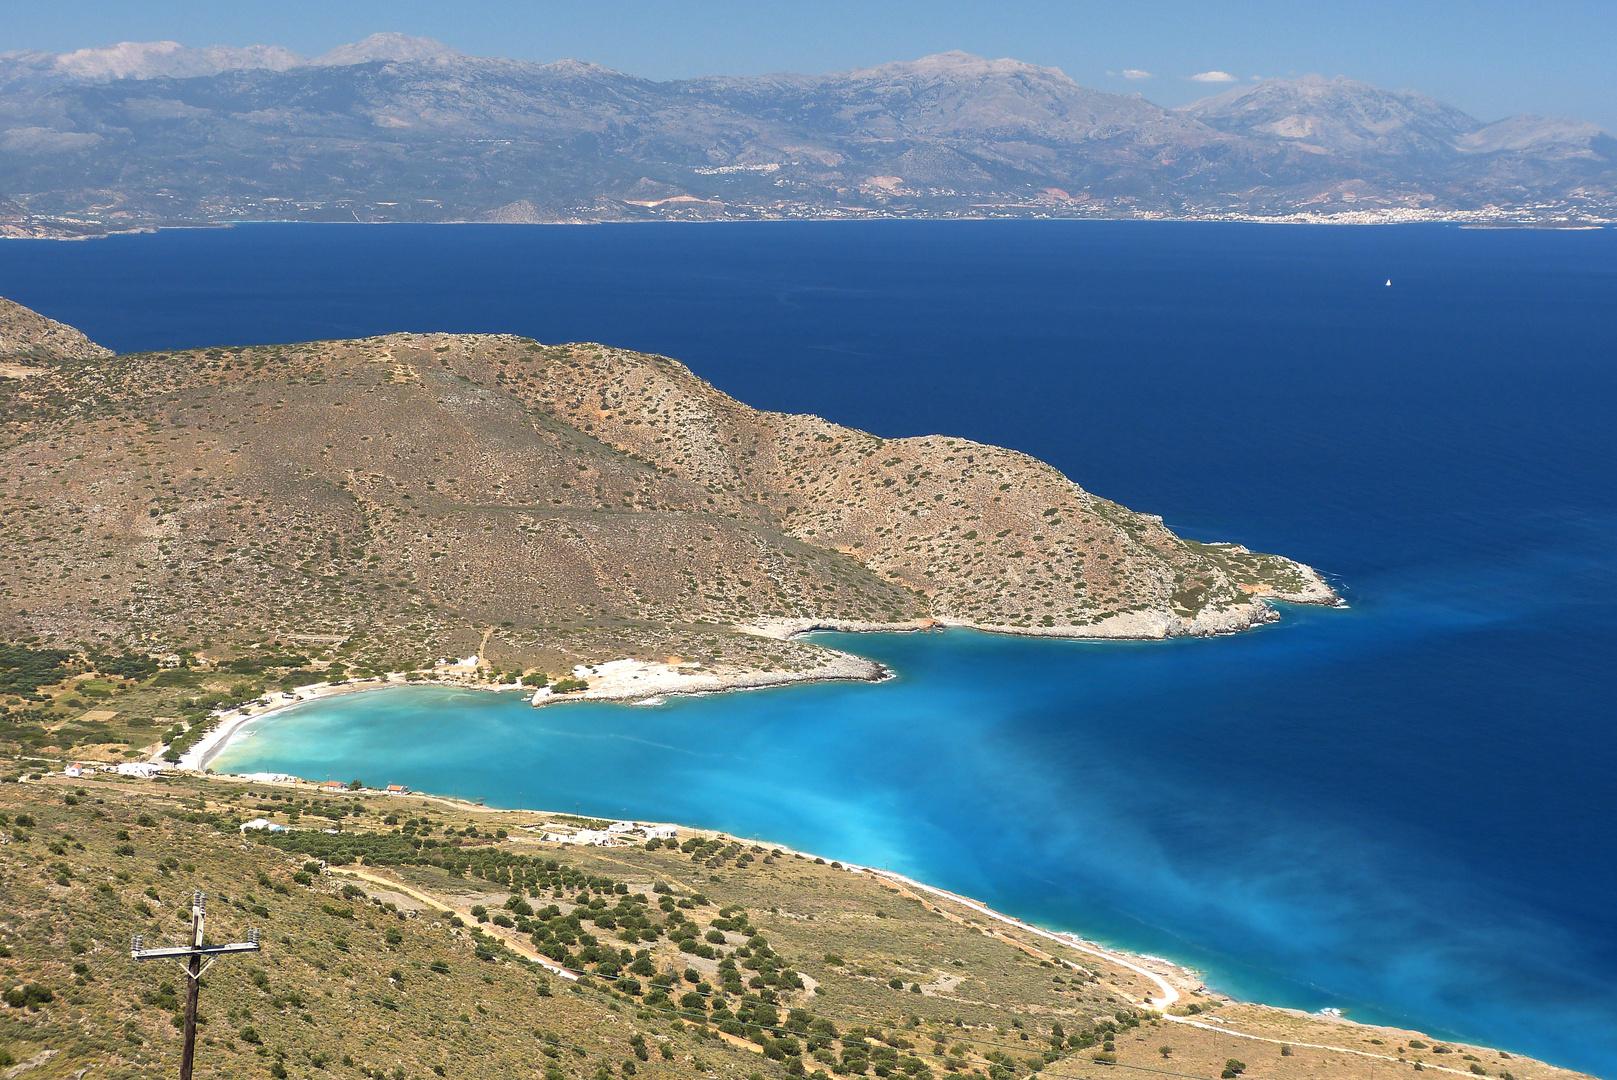 Meeresbucht bei Platanos (Kreta)